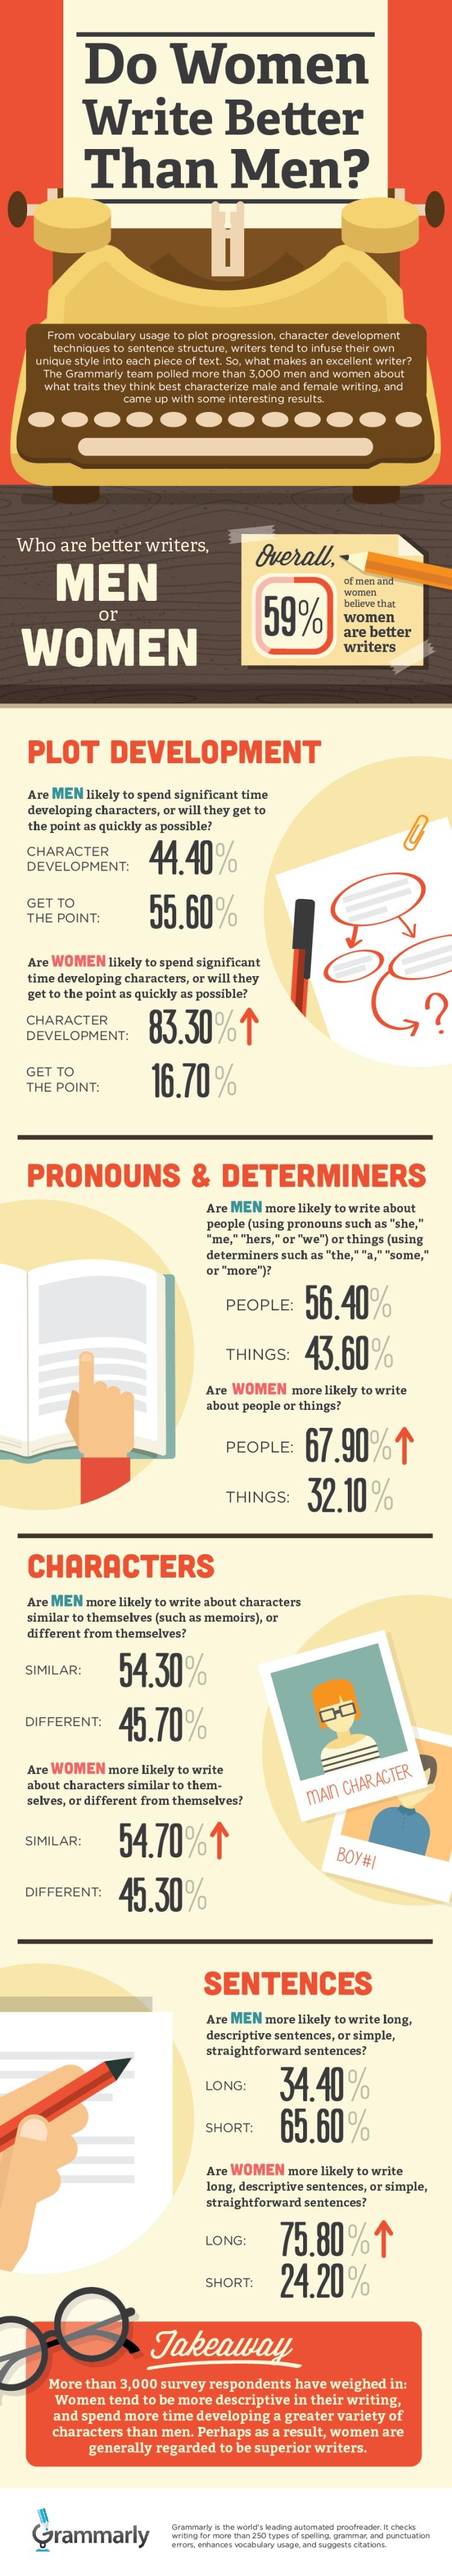 Grammarly_MenvsWomen_Writers_infographic